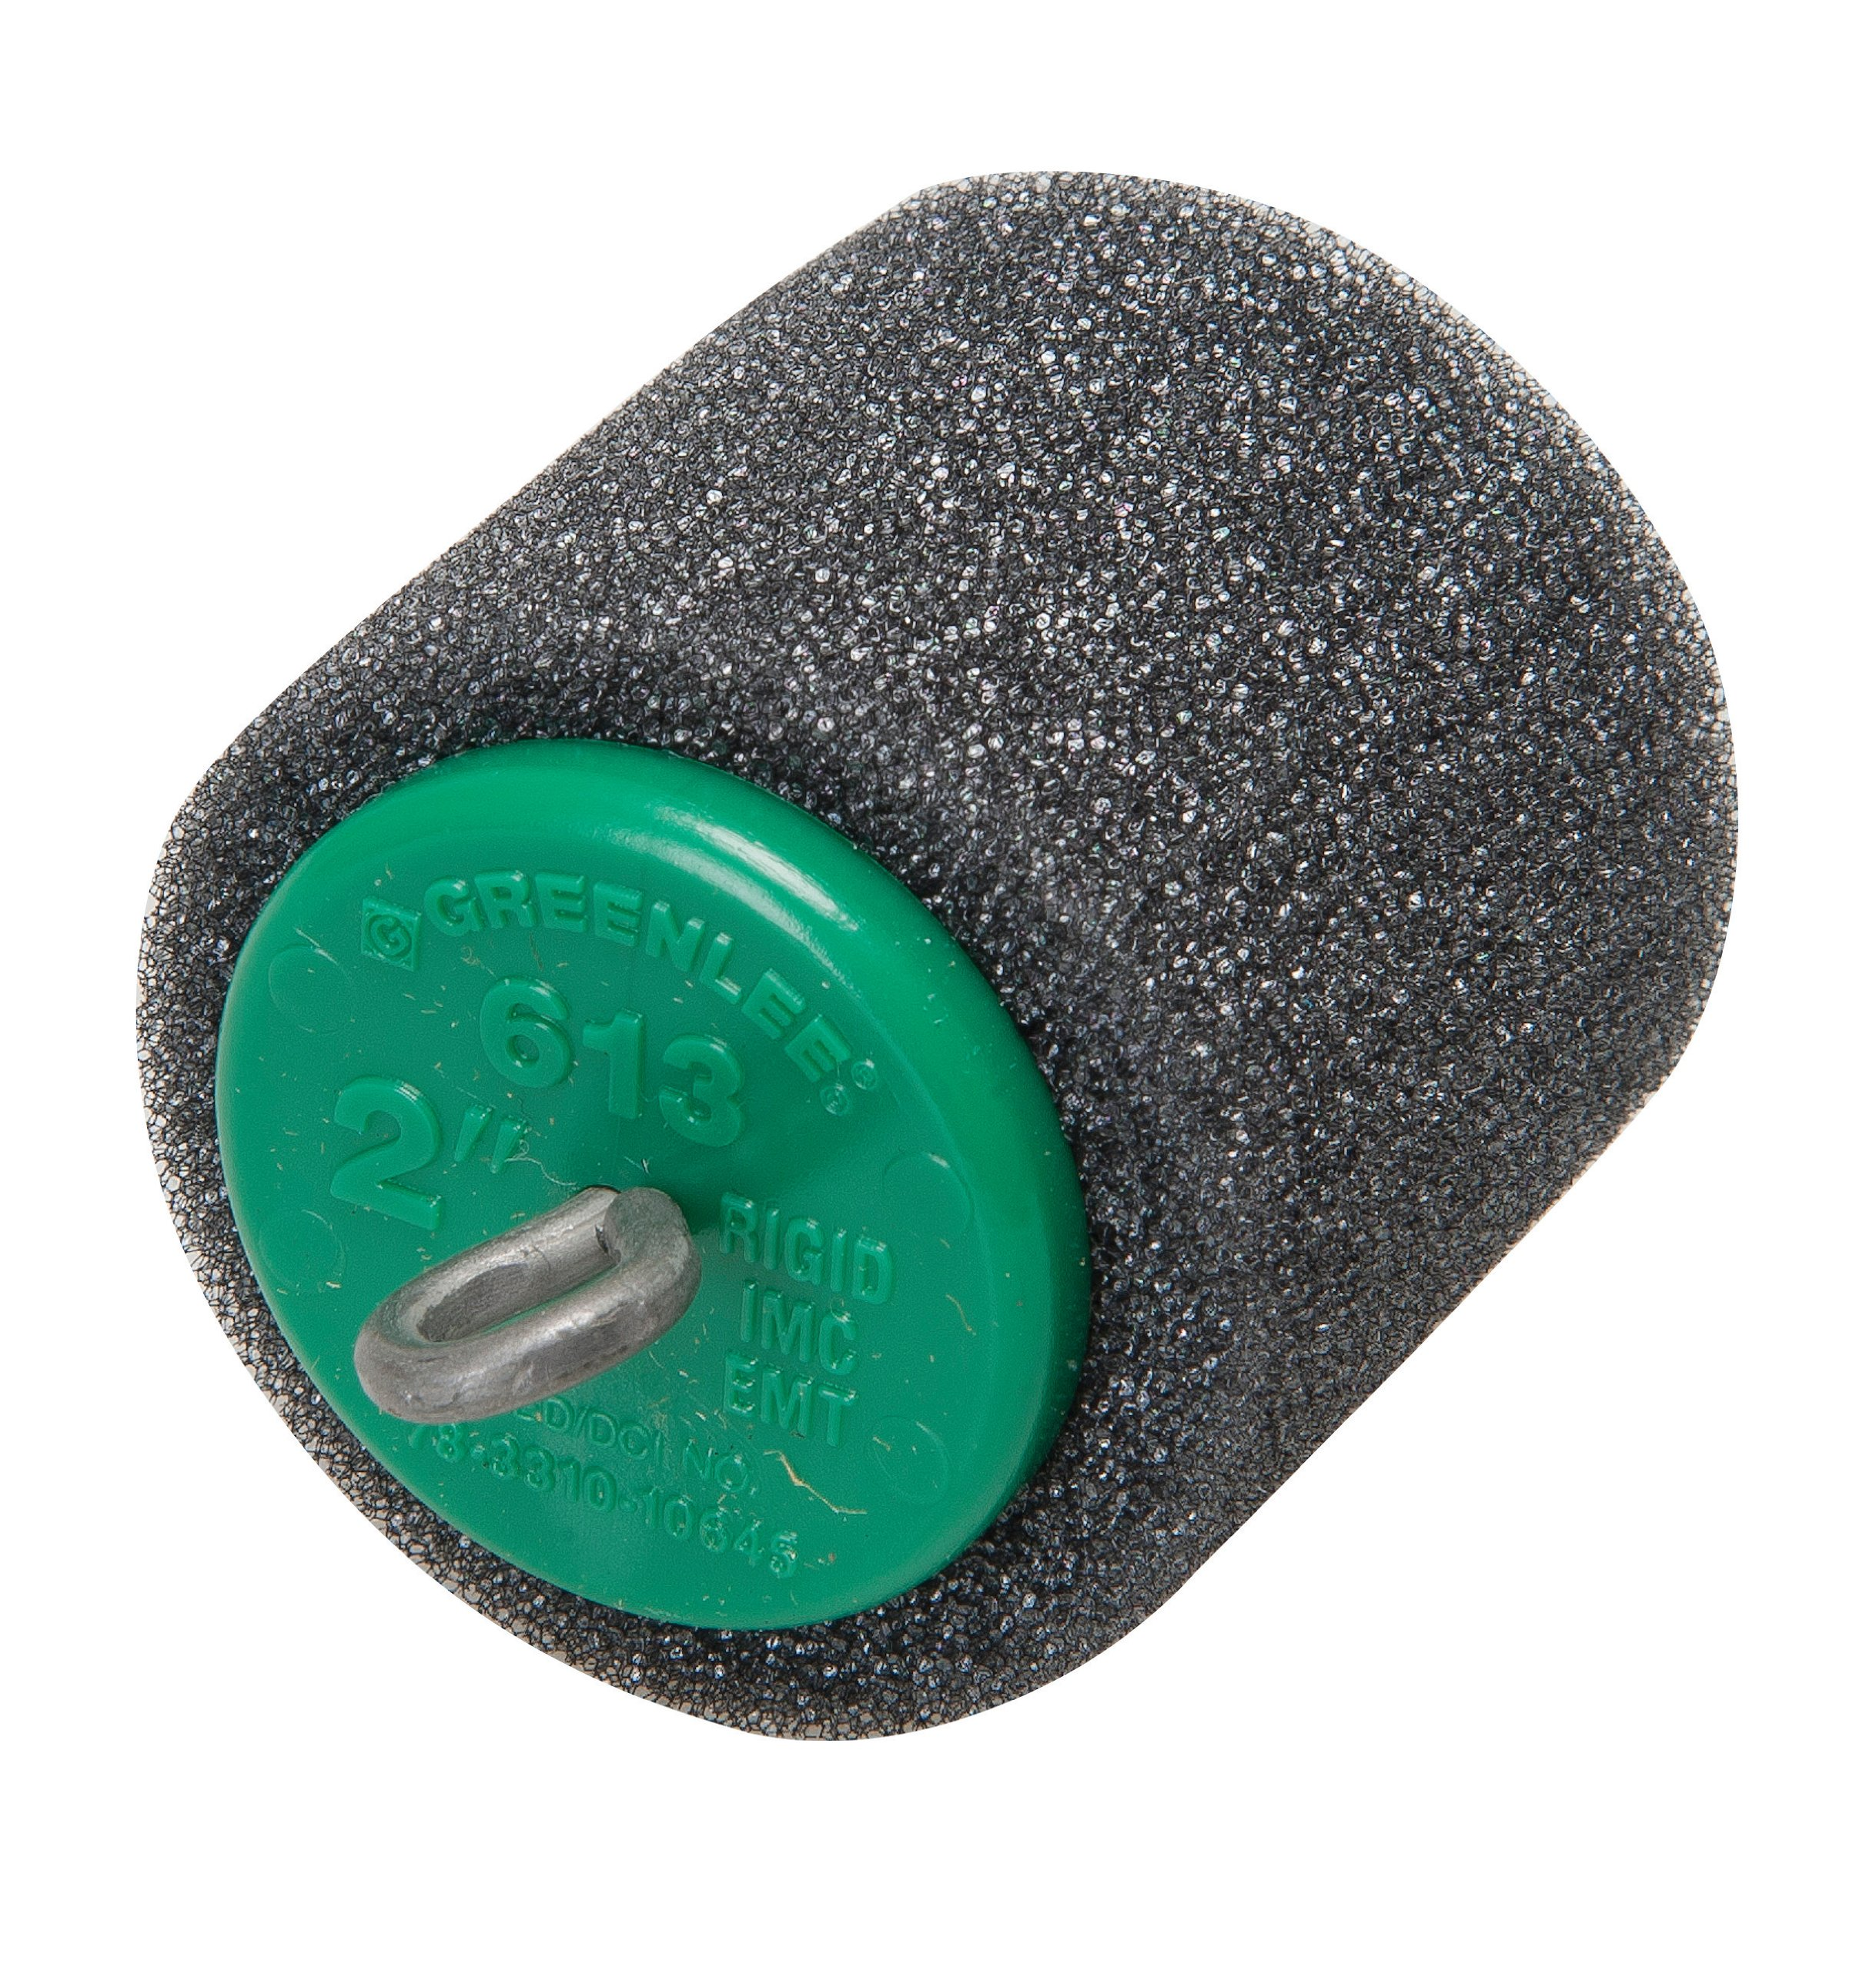 Greenlee 619 Piston for 6-Inch Conduit